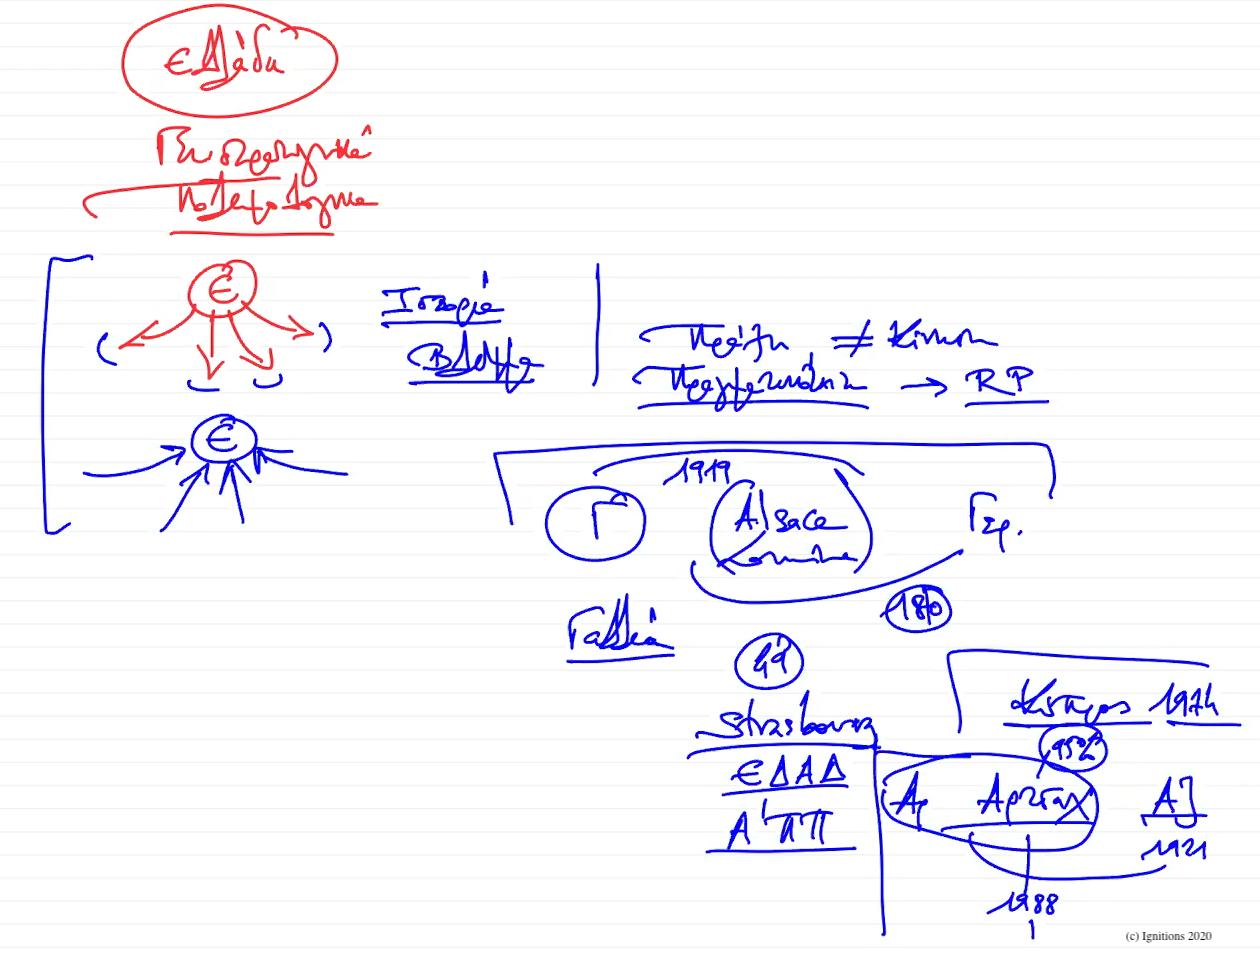 56026 - XVI - e-Διάλεξη: Ελληνική Γεωστρατηγική I. (Dessin)